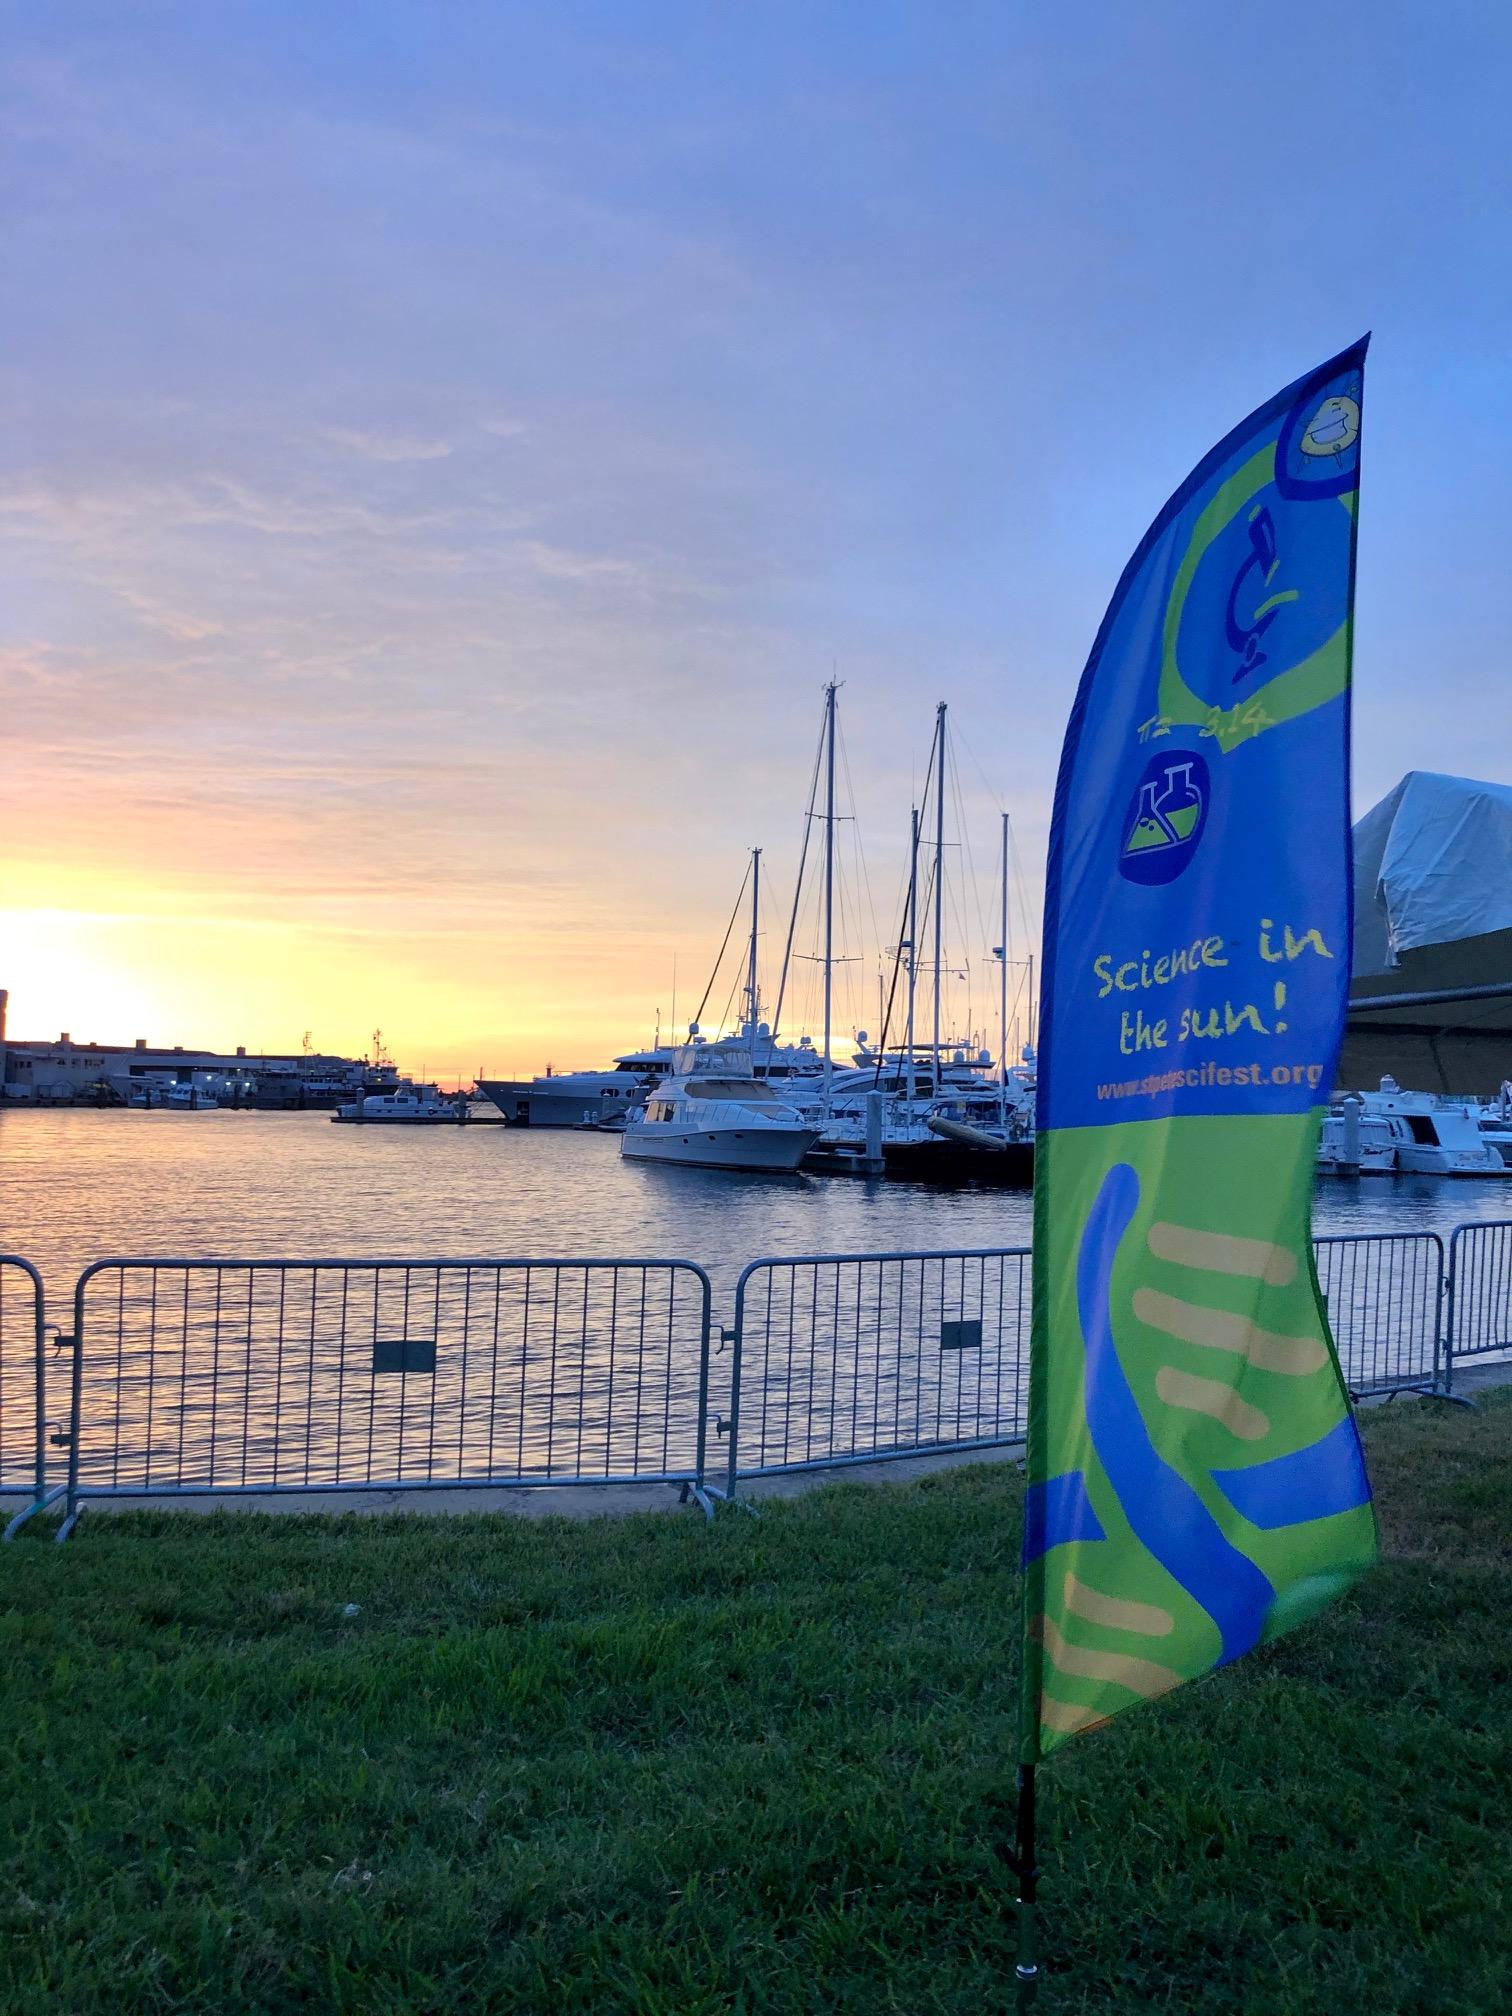 Sunrise over the St Pete science festival